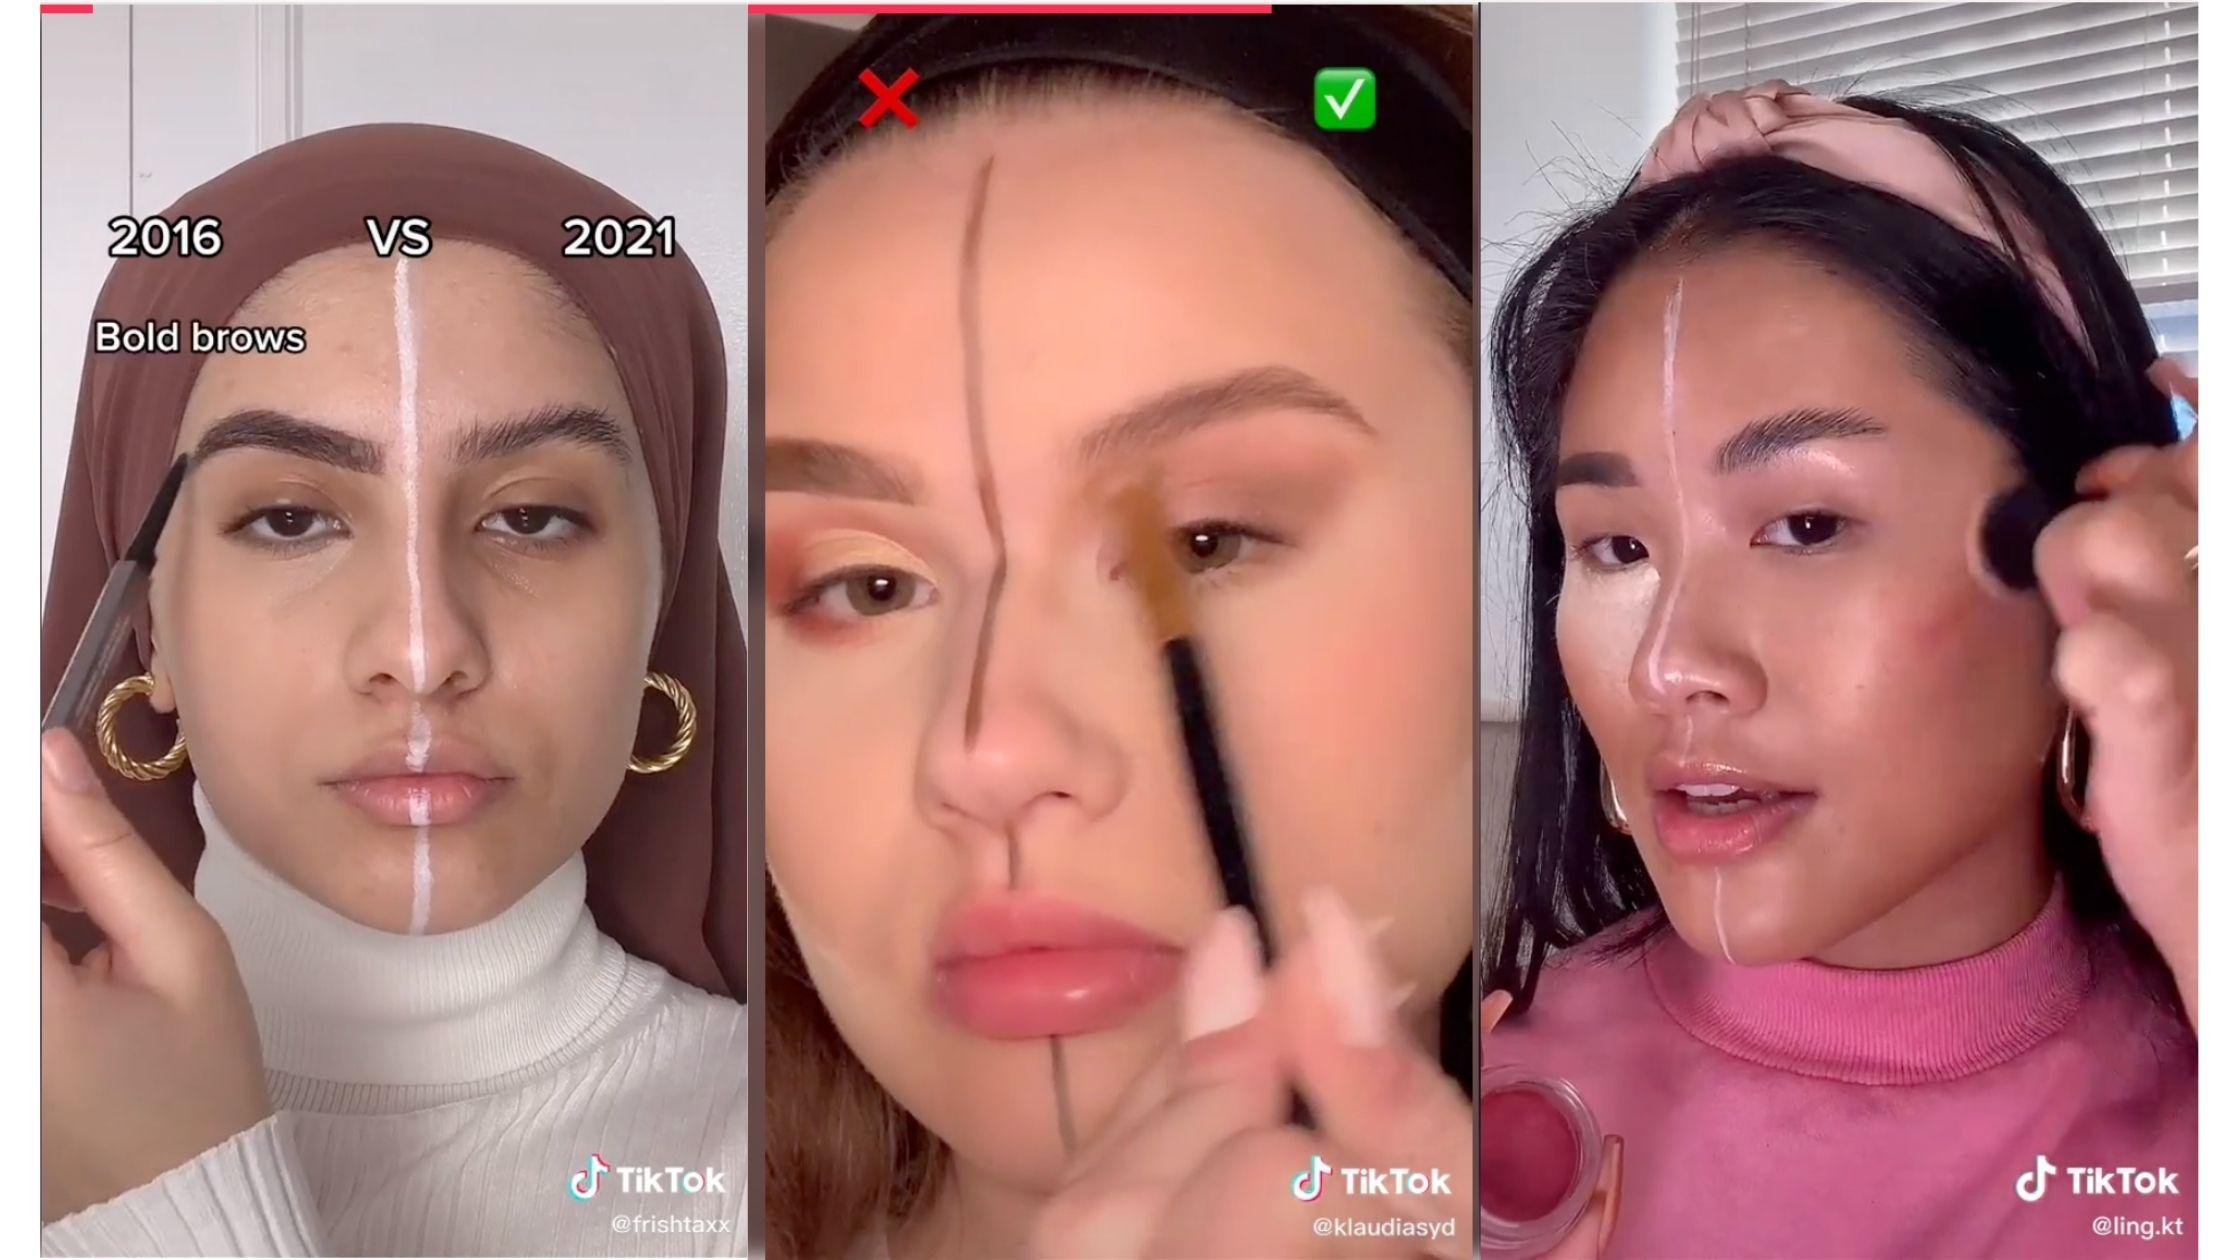 2016 vs 2021, The Makeup Challenge Taking Over Tiktok